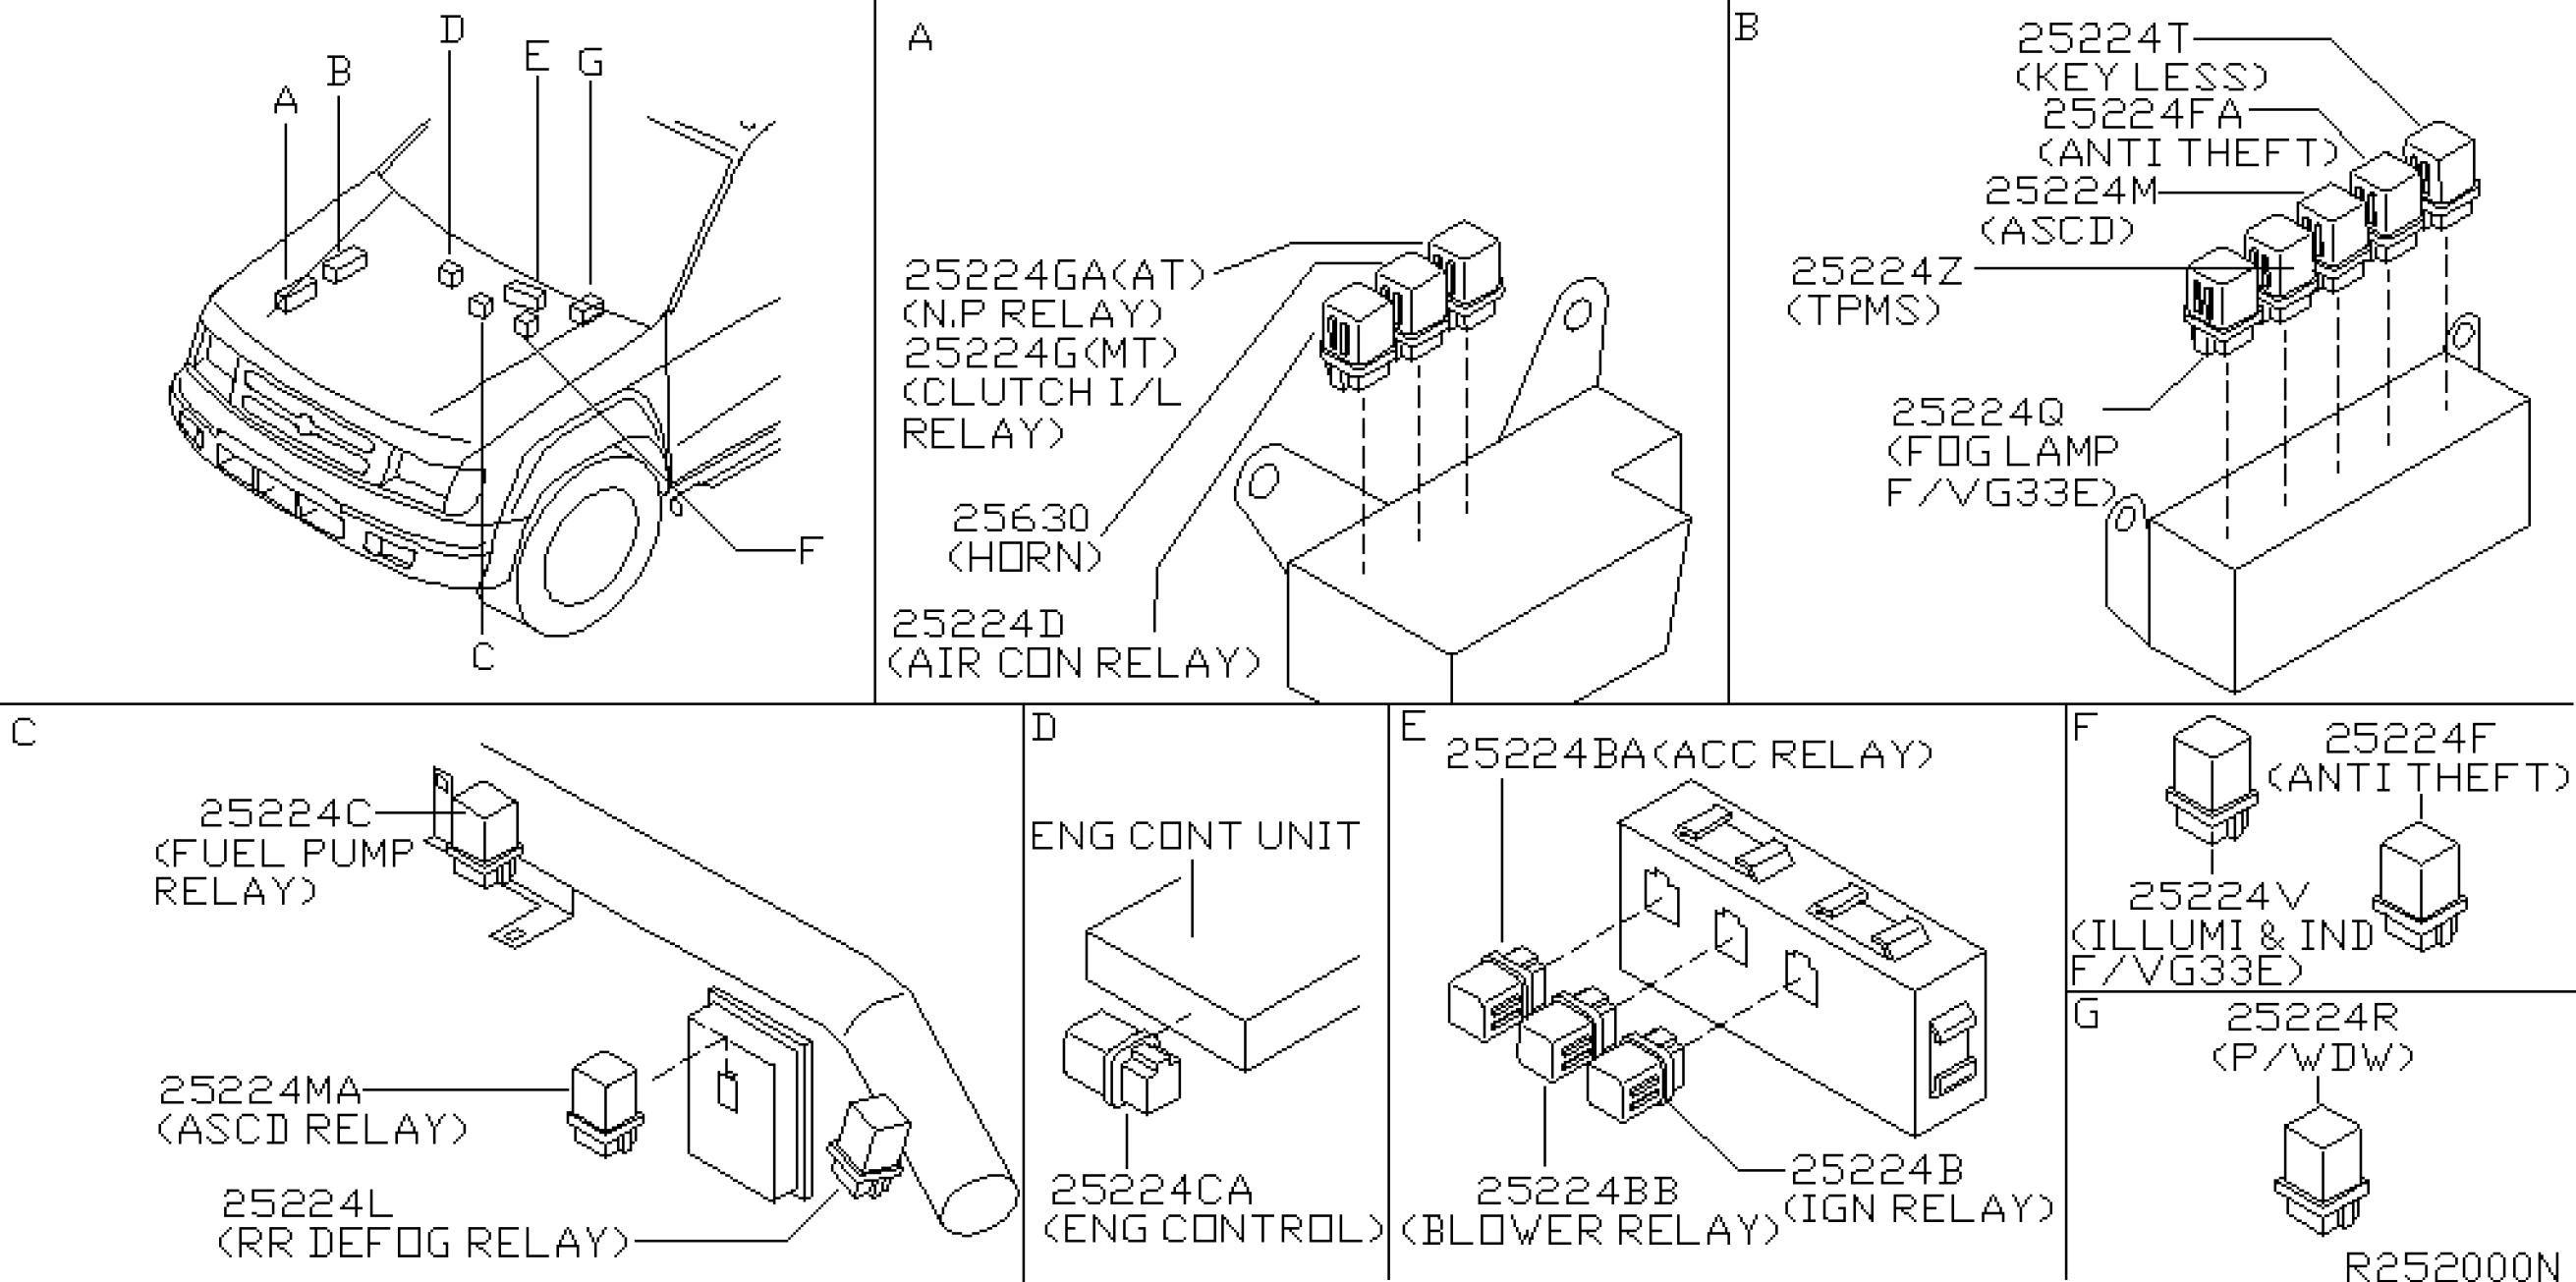 2004 nissan xterra 3300 fuse box diagram explore schematic wiring rh appkhi com